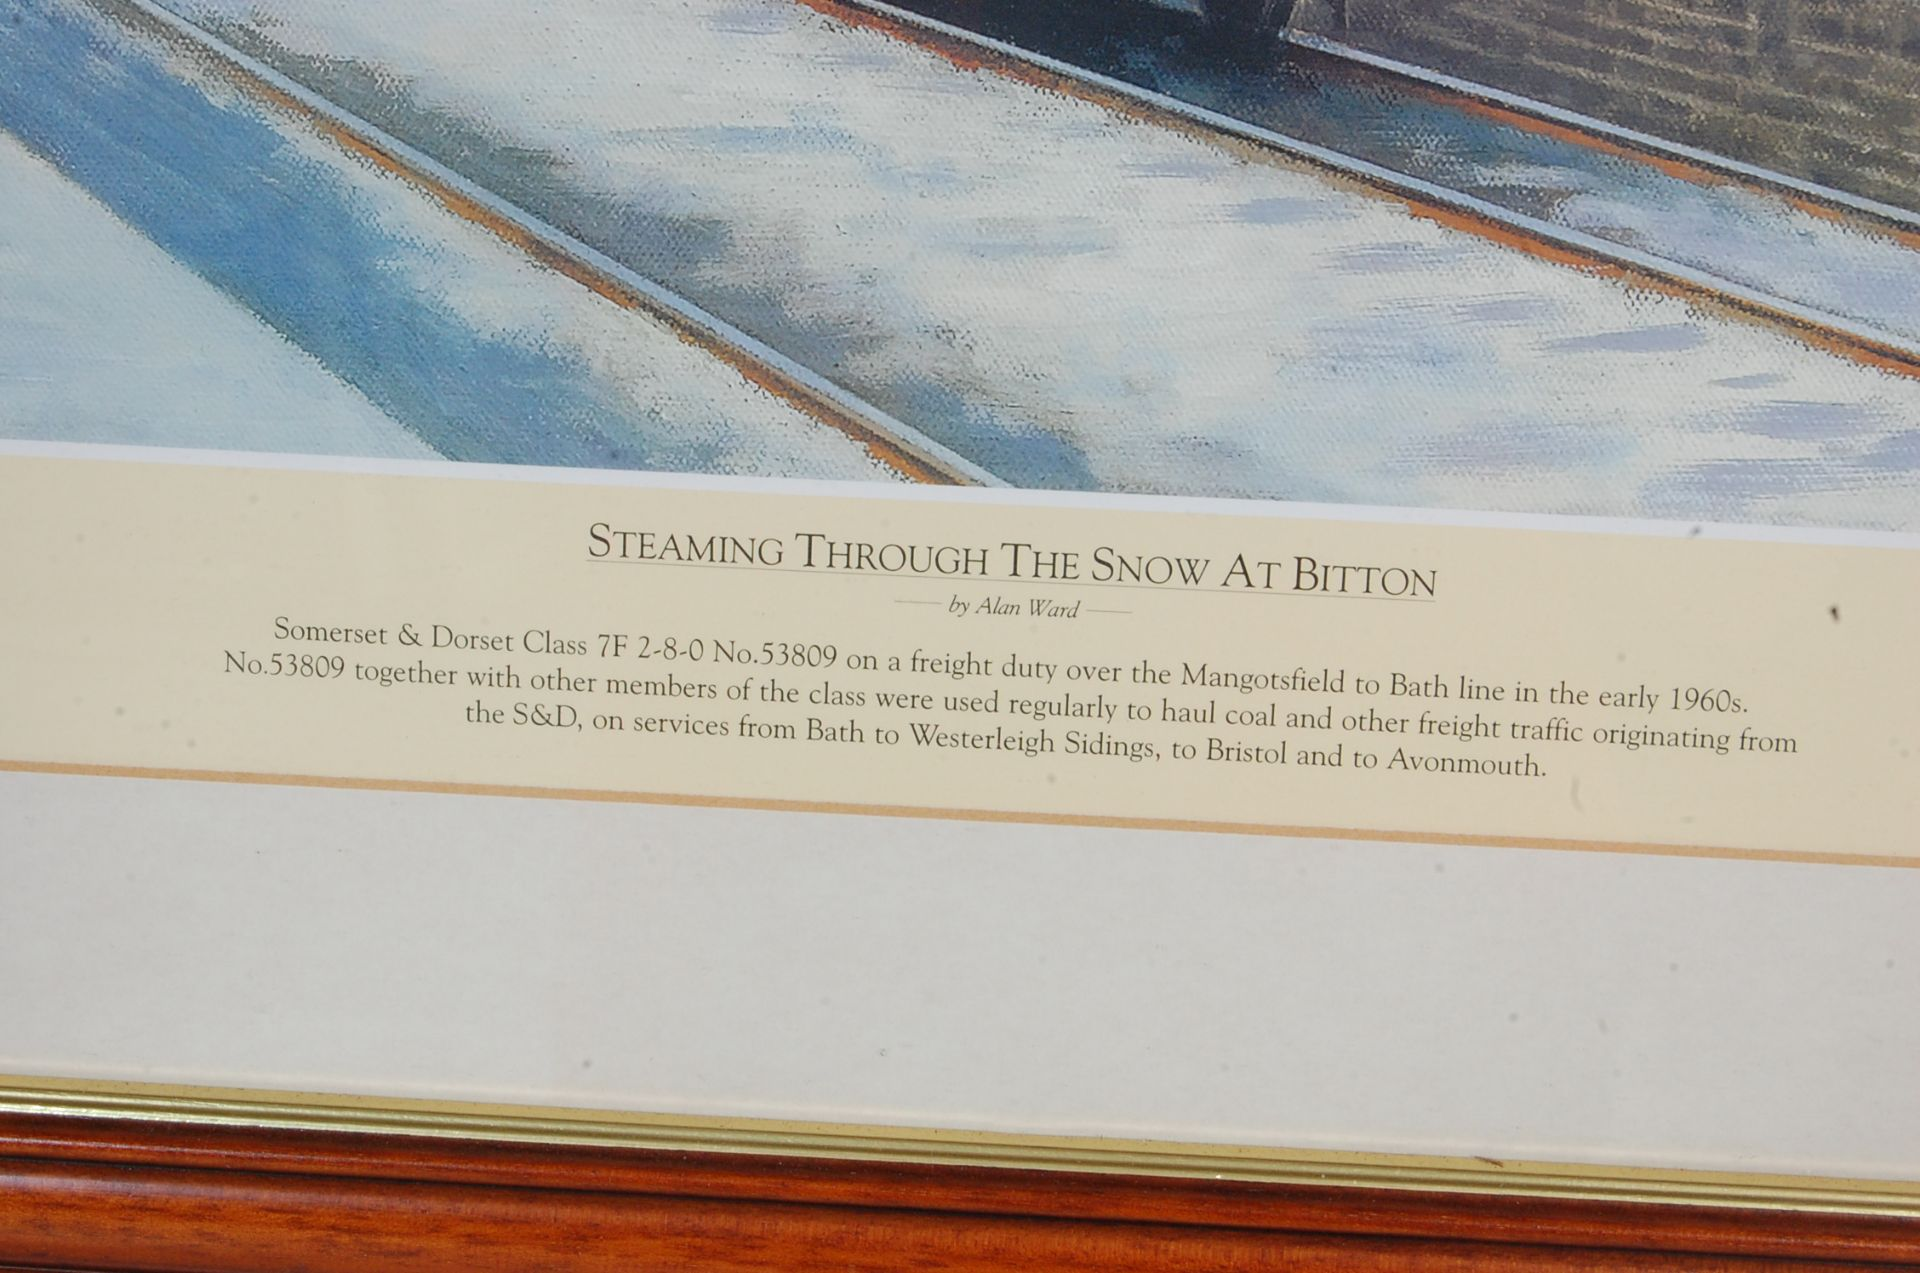 RAILWAY INTEREST - STEAMING THROUGH THE SNOW AT BITTON - LTD ED PRINT - Bild 6 aus 9